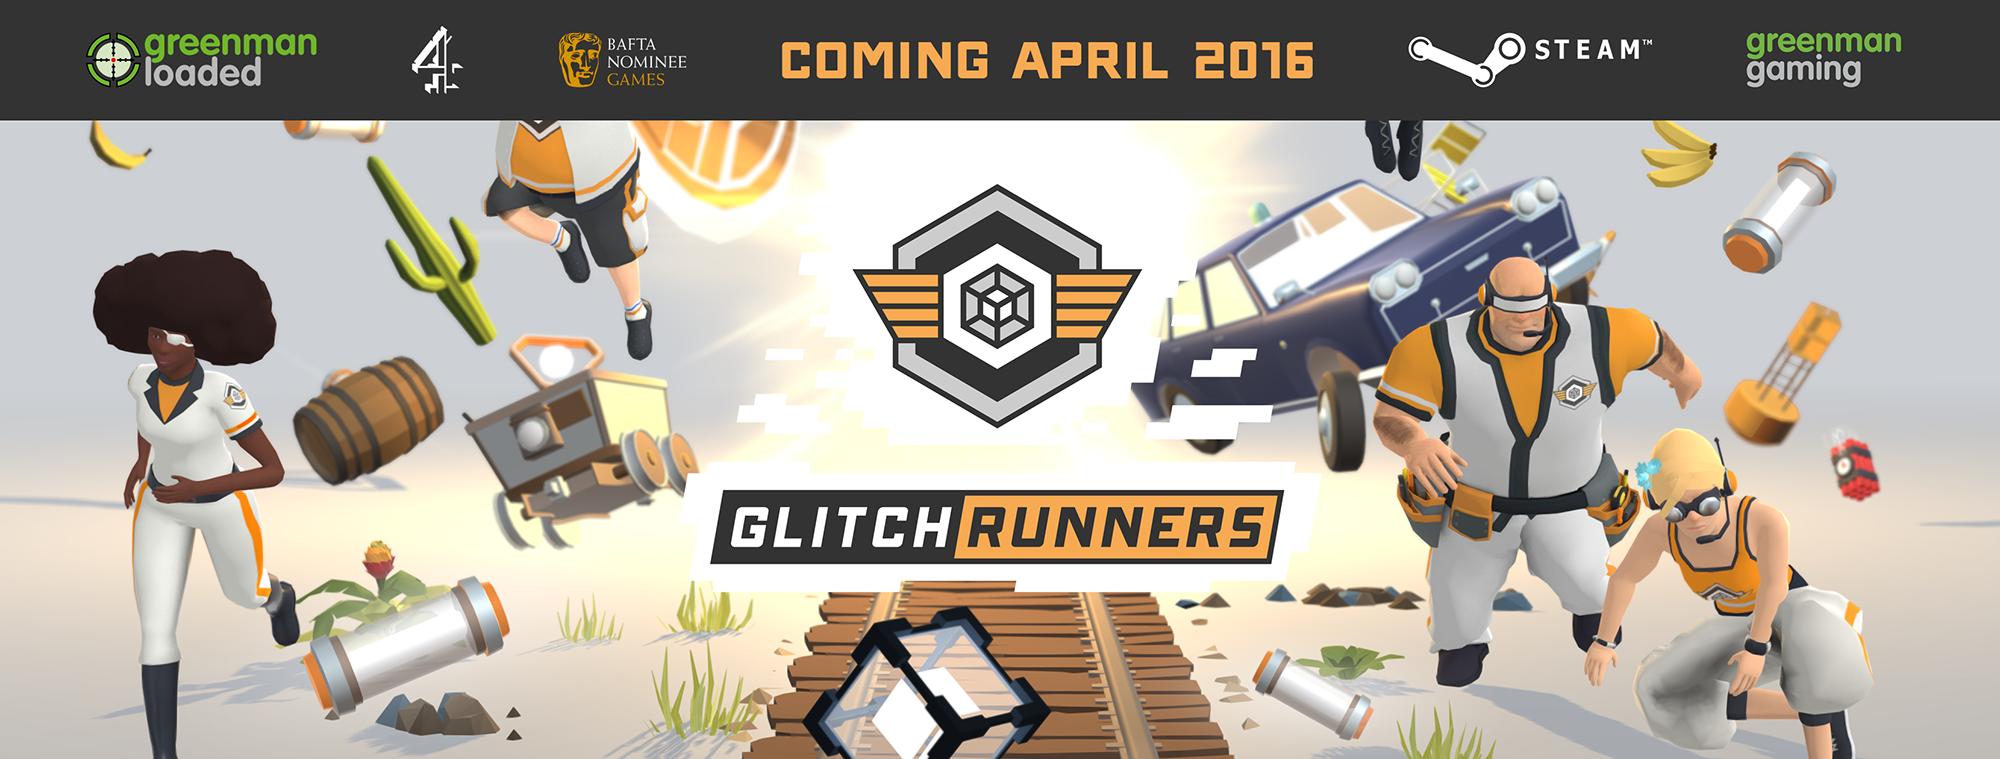 Glitchrunners Demo